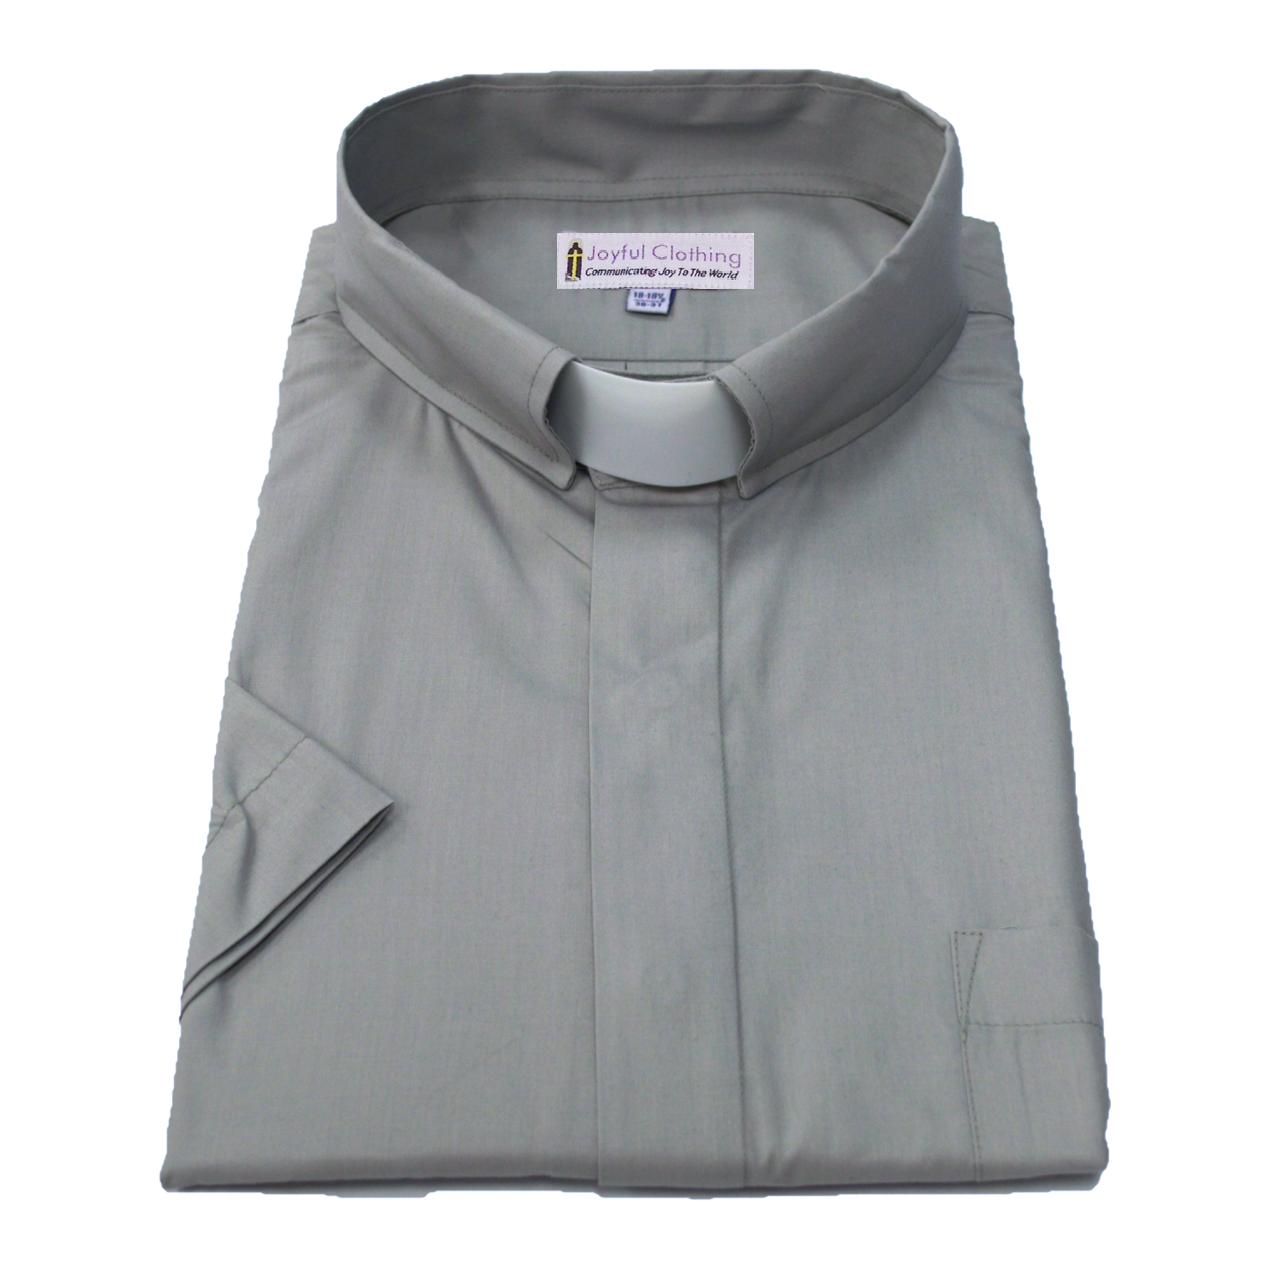 161. Men's Short-Sleeve Tab-Collar Clergy Shirt - Gray